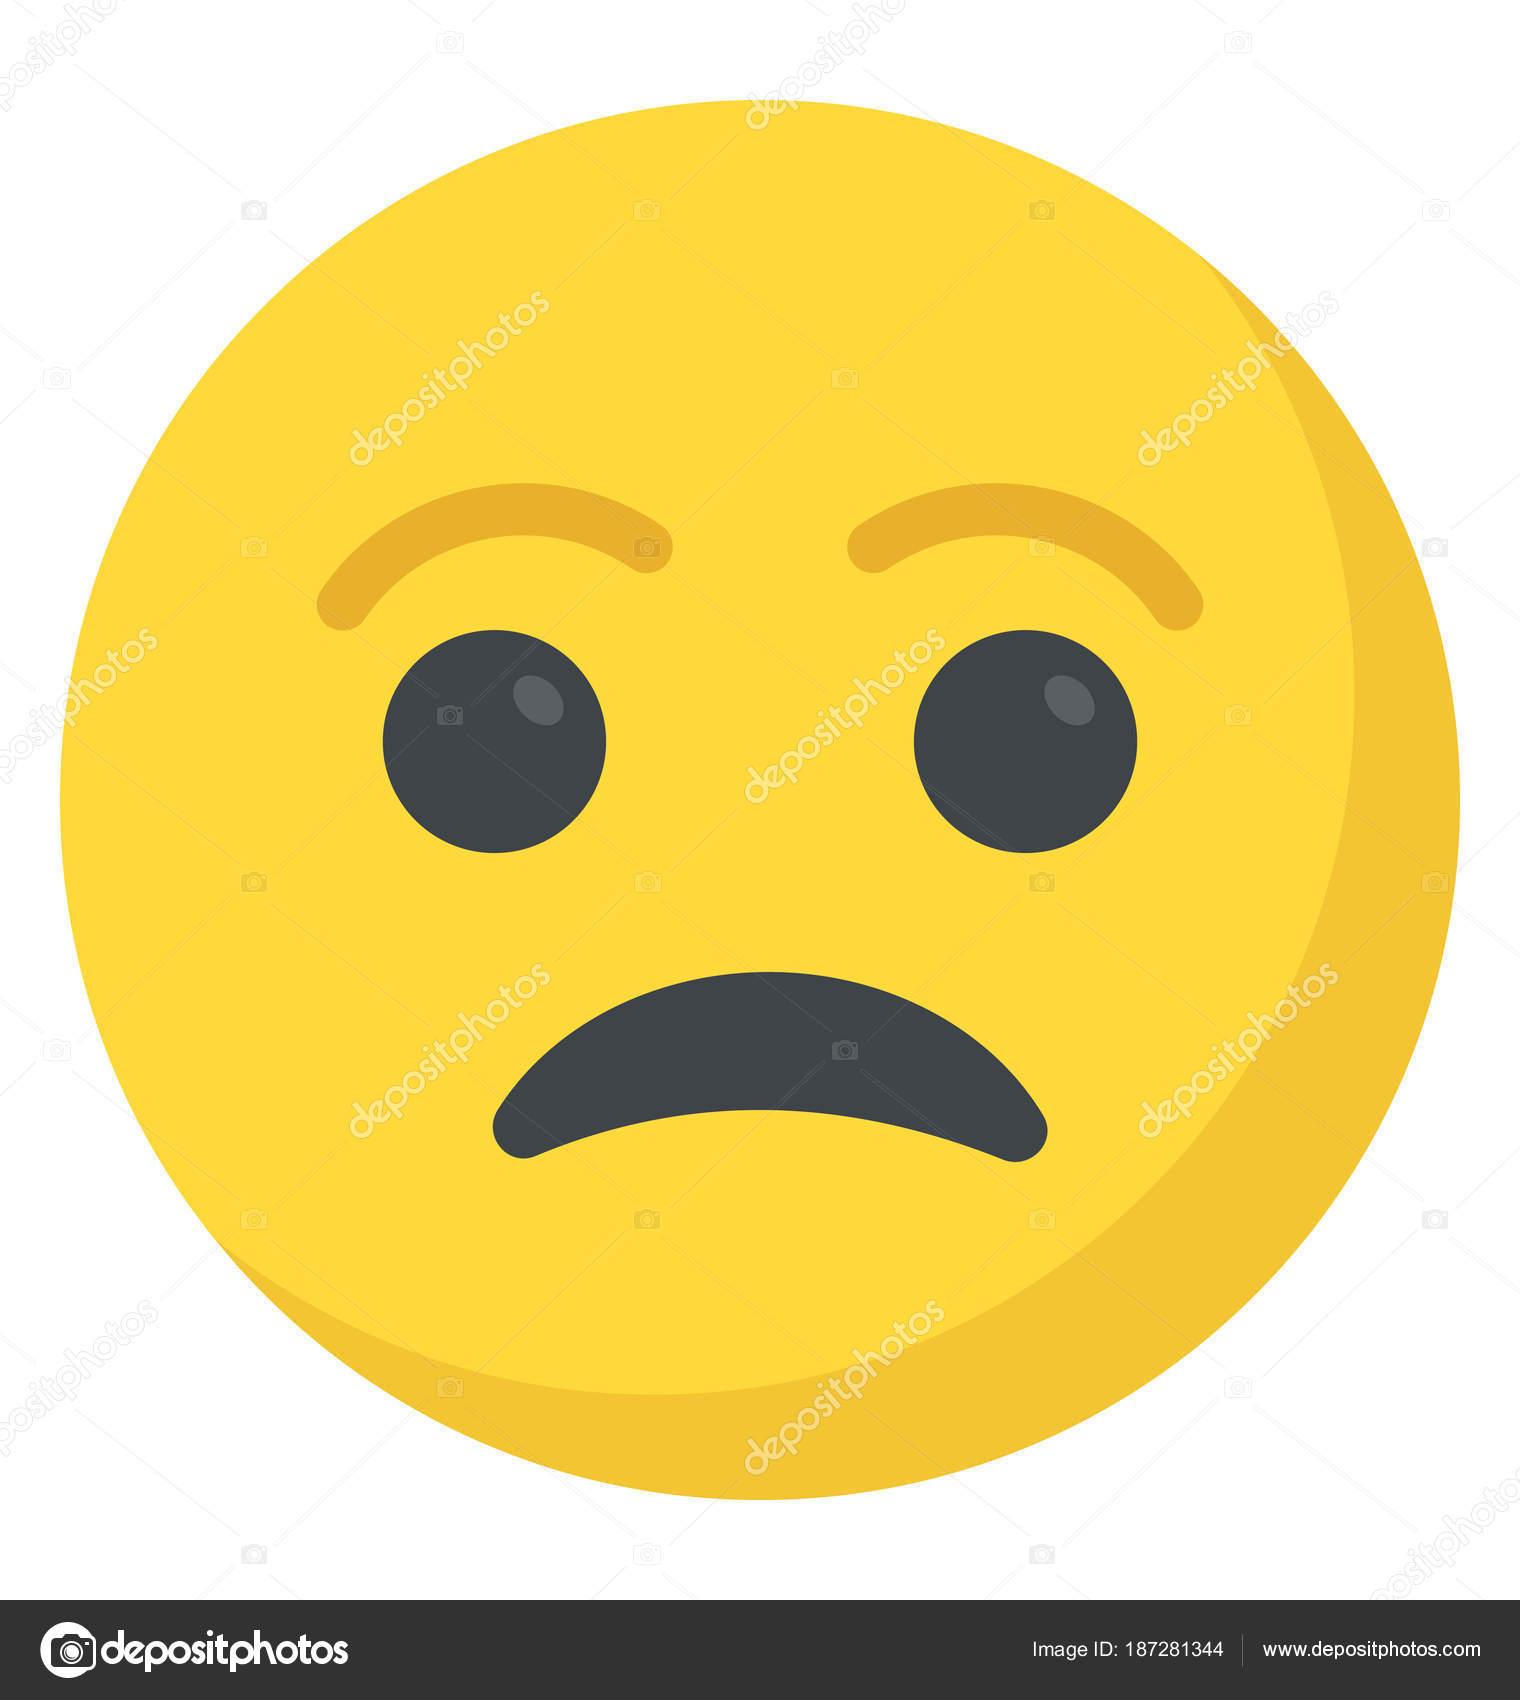 Sad smiley face depressed concept stock vector vectorspoint sad smiley face depressed concept stock vector buycottarizona Choice Image